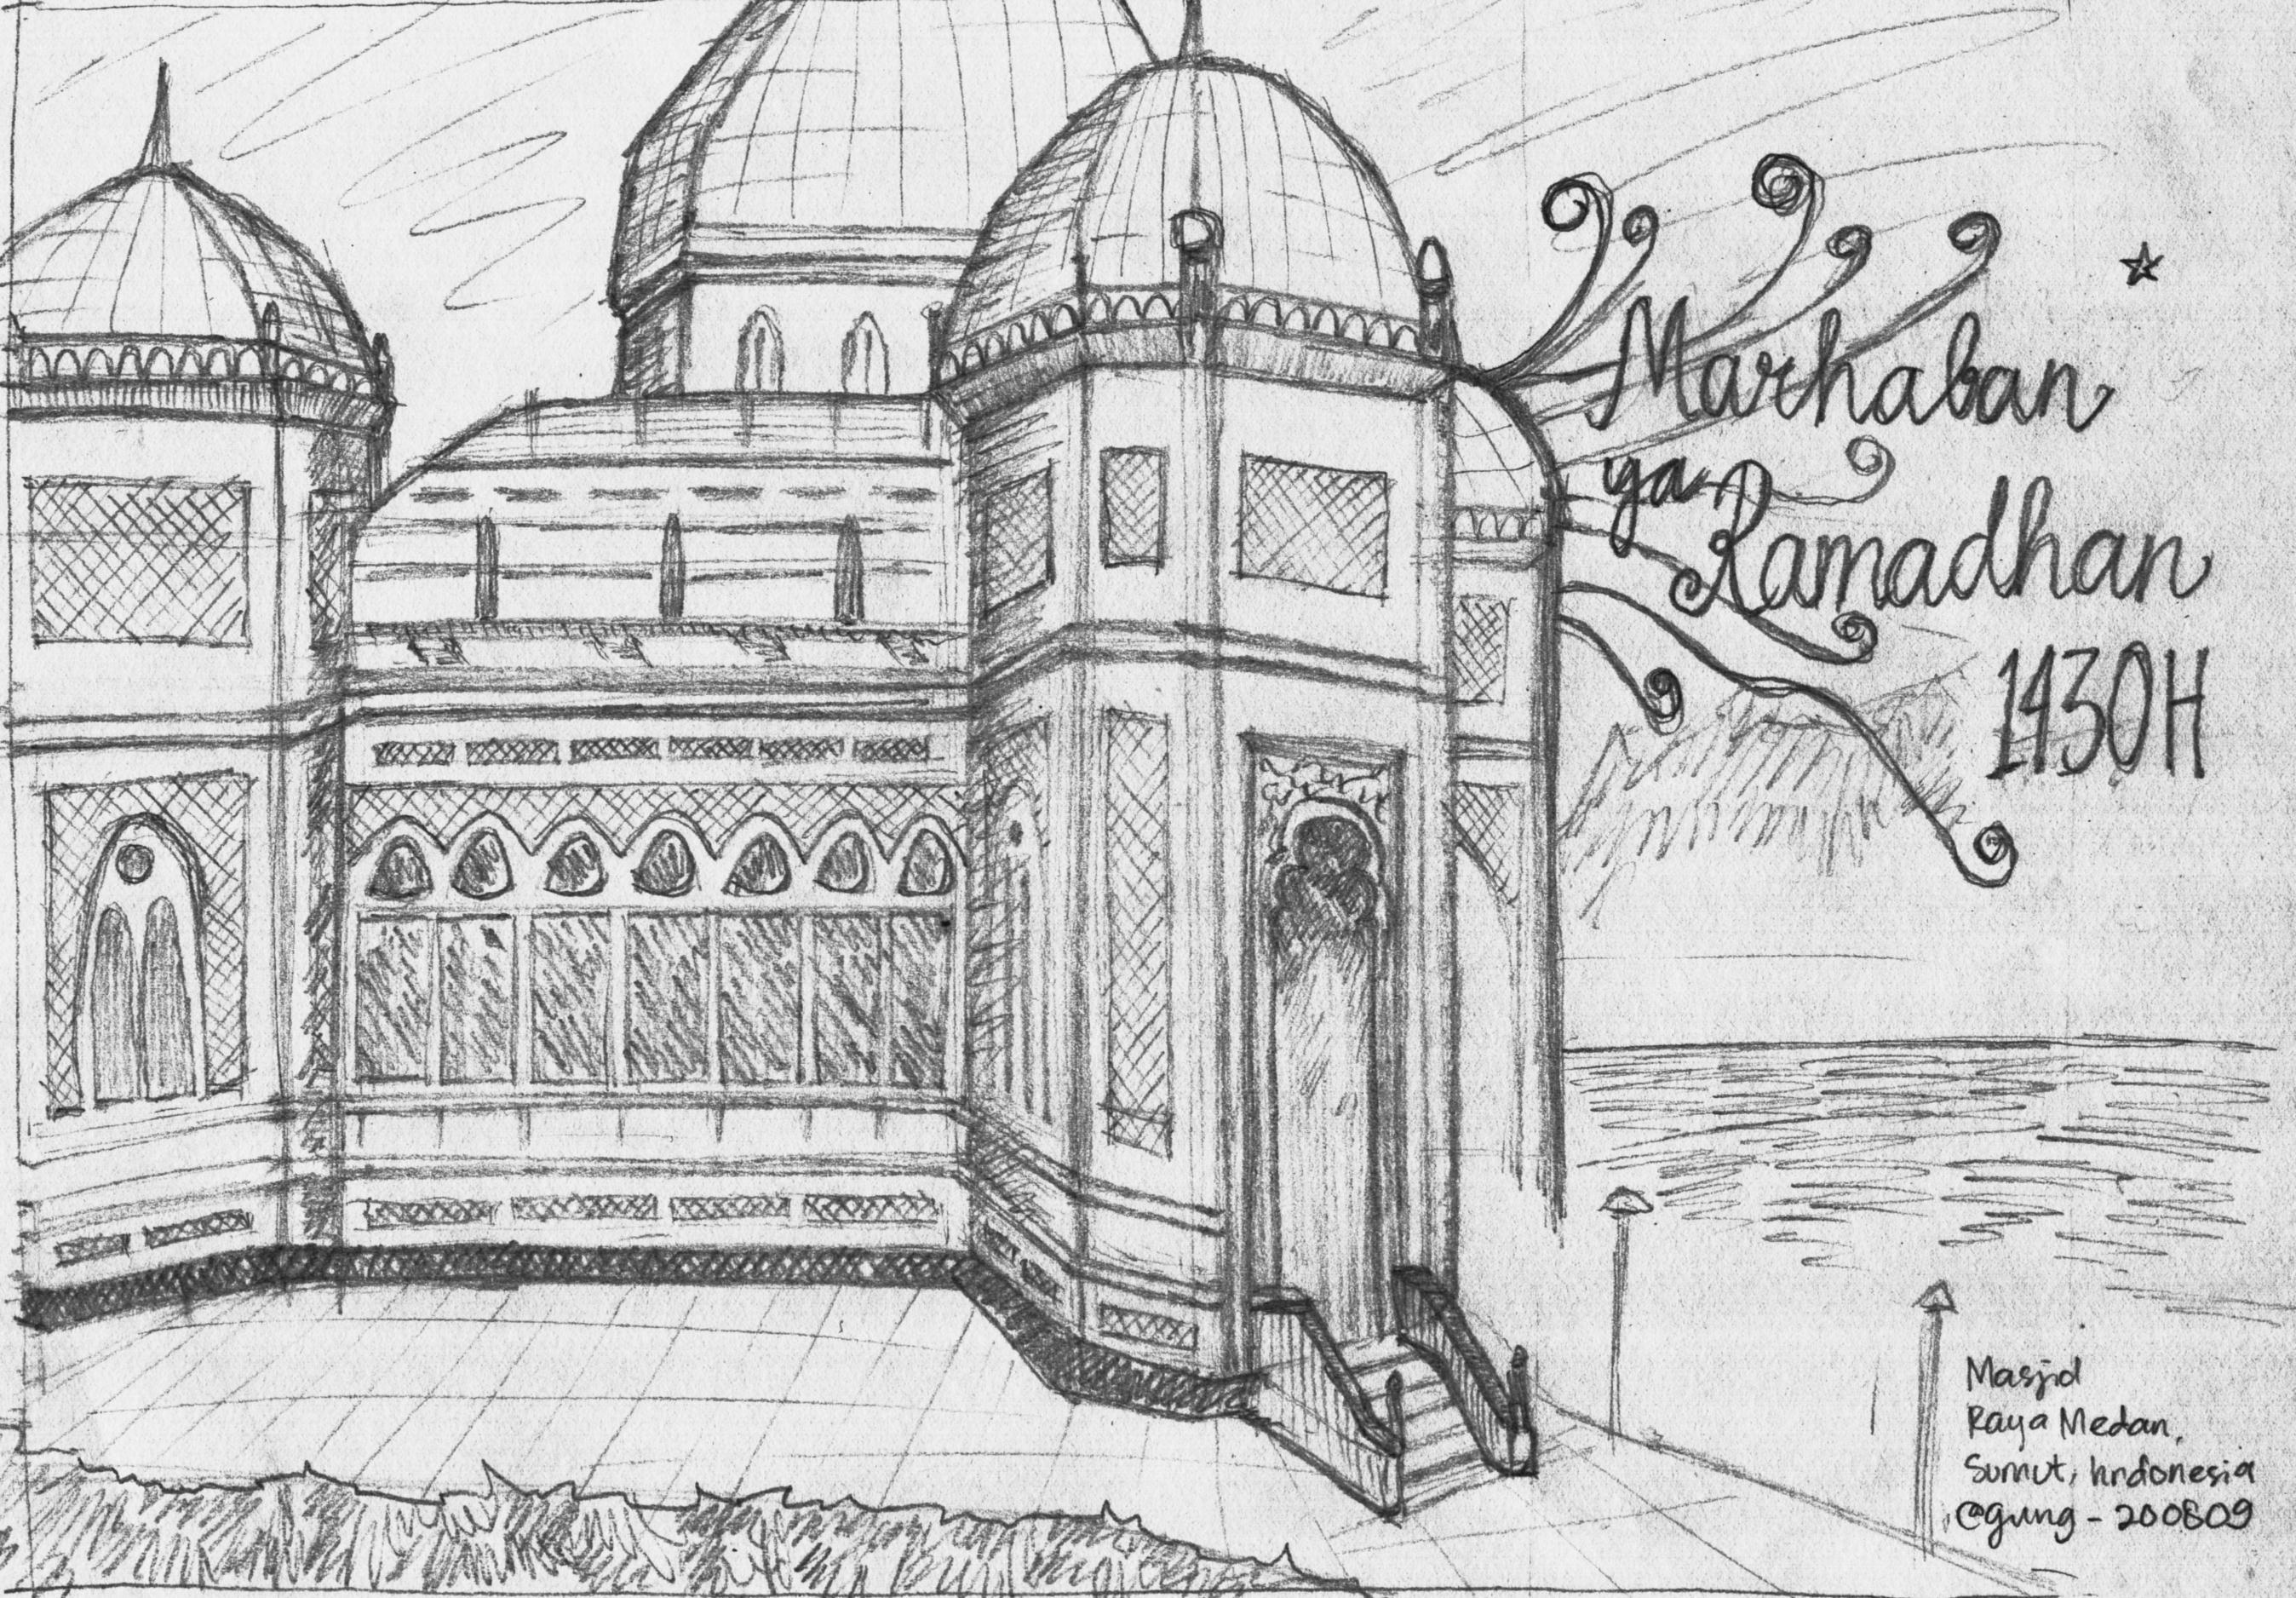 Marhaban Ya Ramadhan 1430 H – Mau Jadi Ayah Soleh